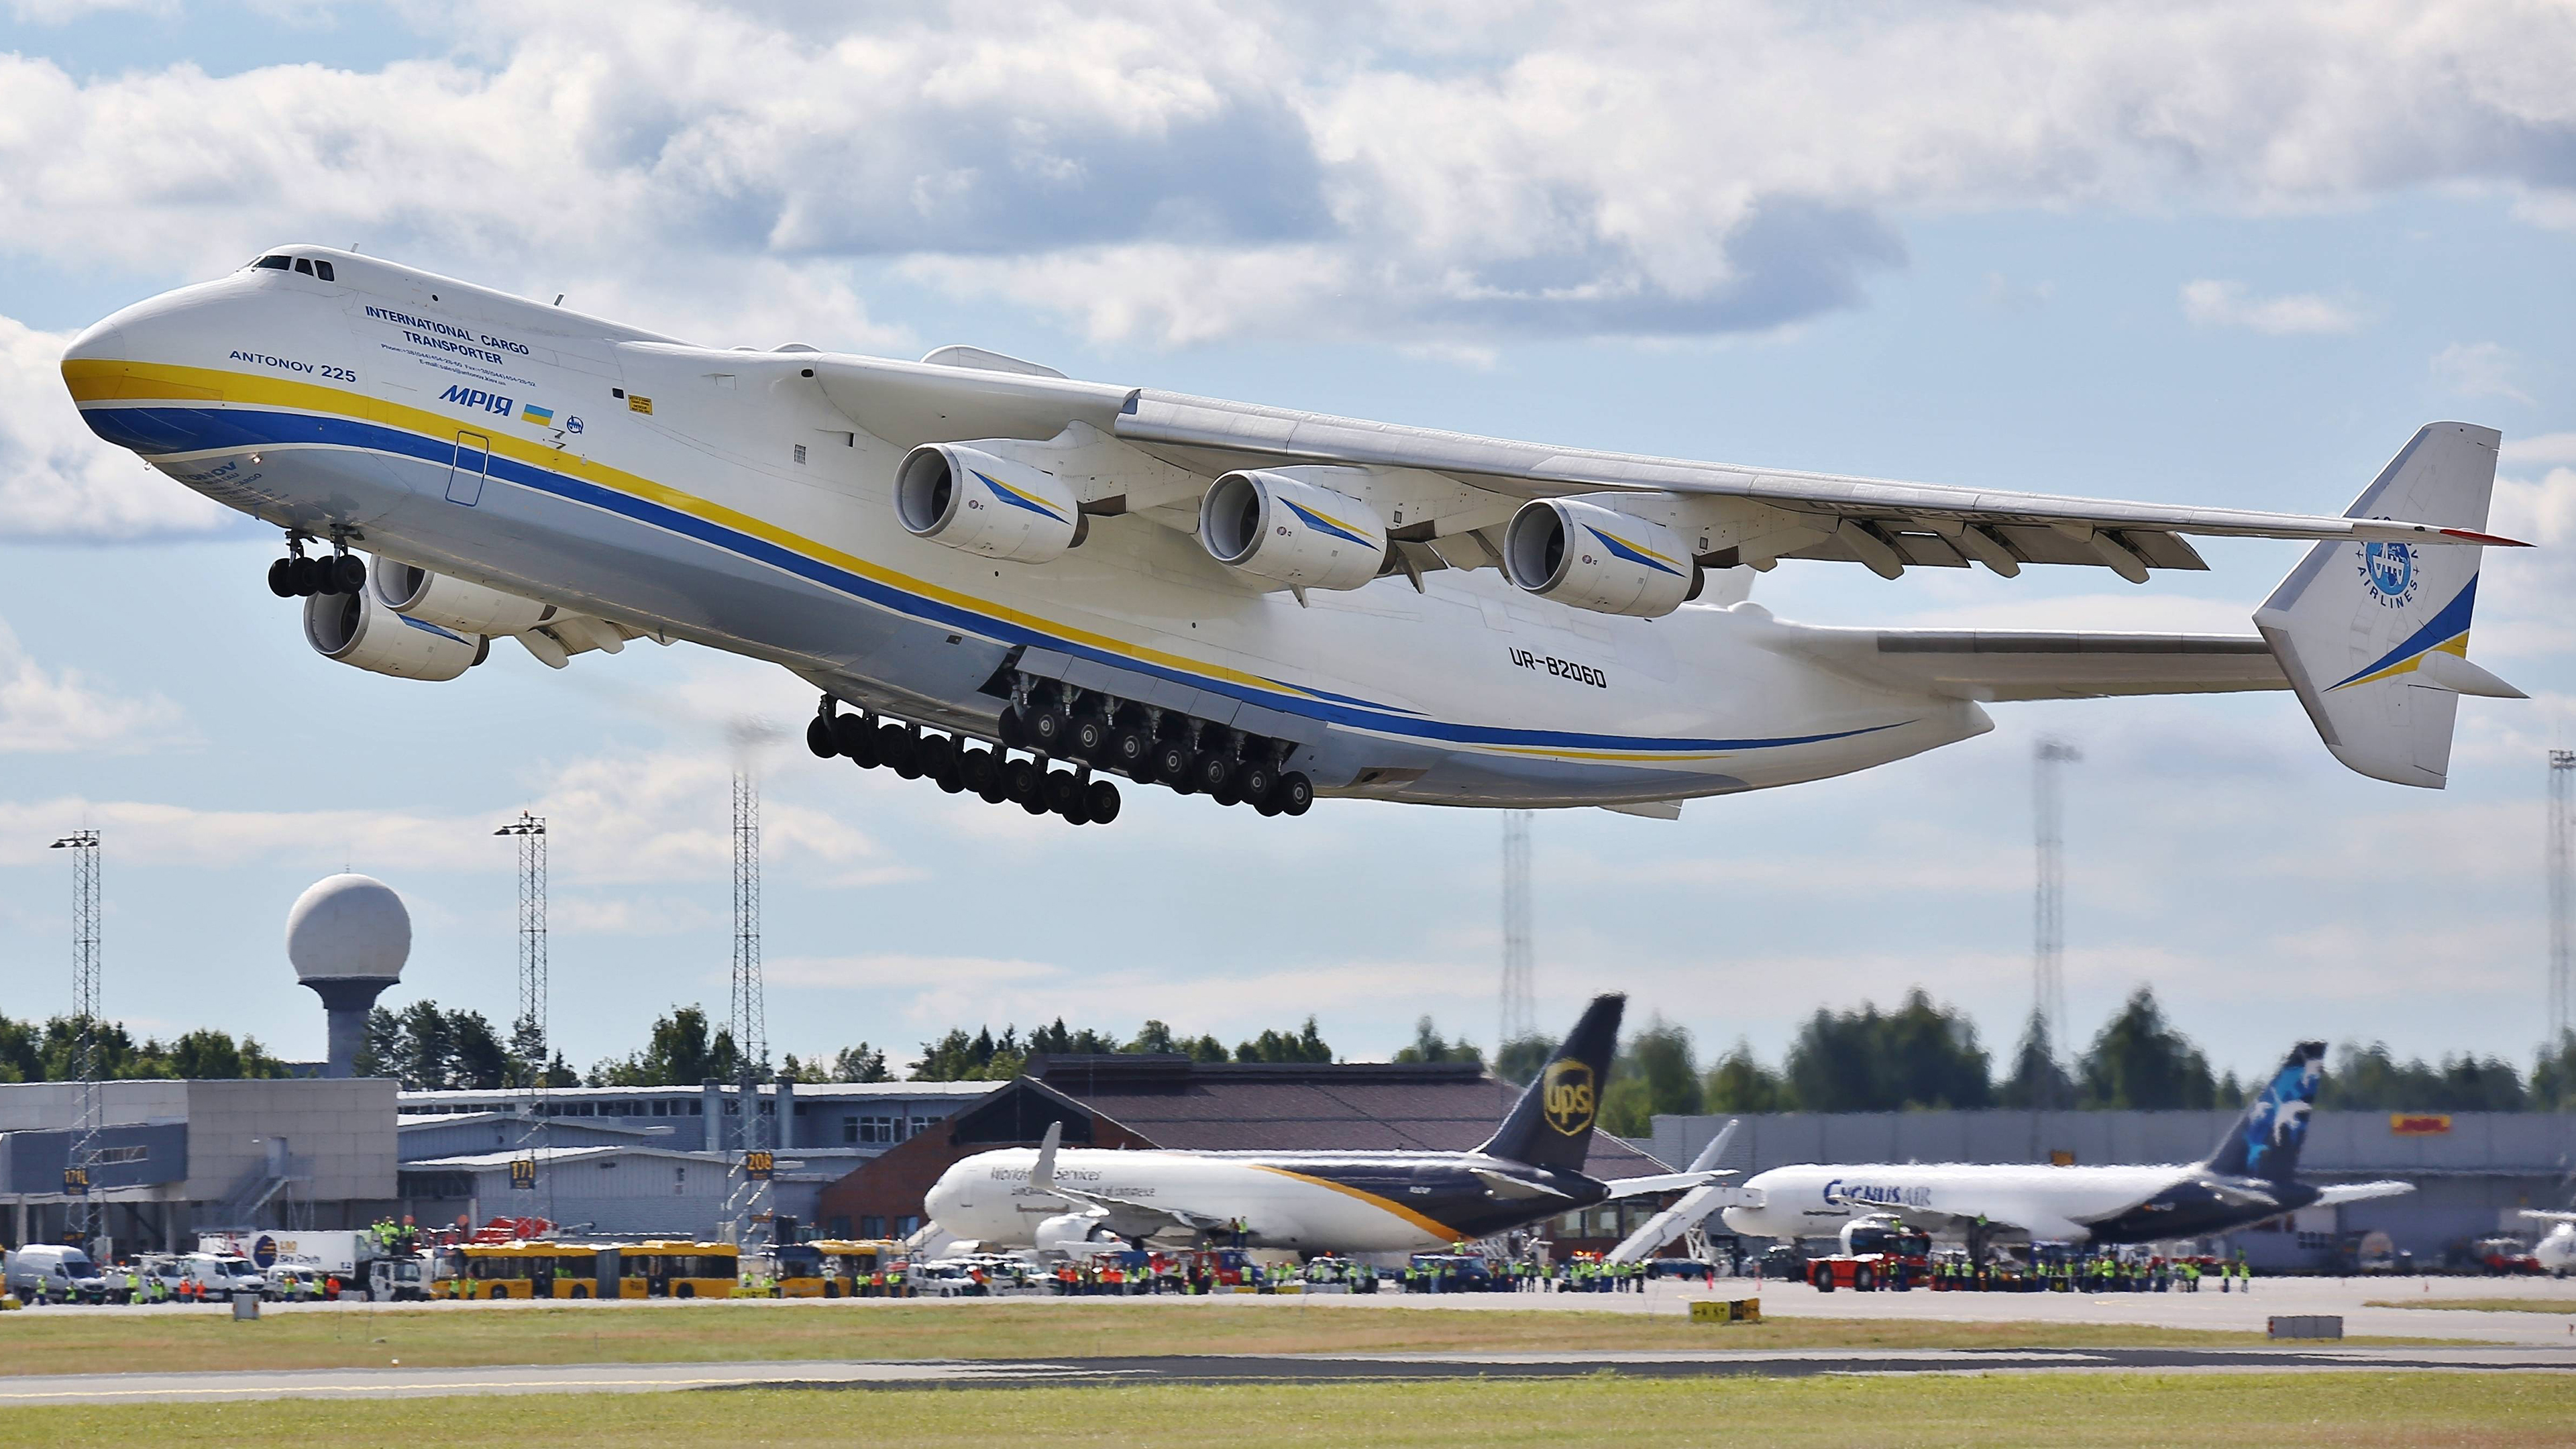 General 3840x2160 Antonov An-225 Mriya aircraft airport transport cargo